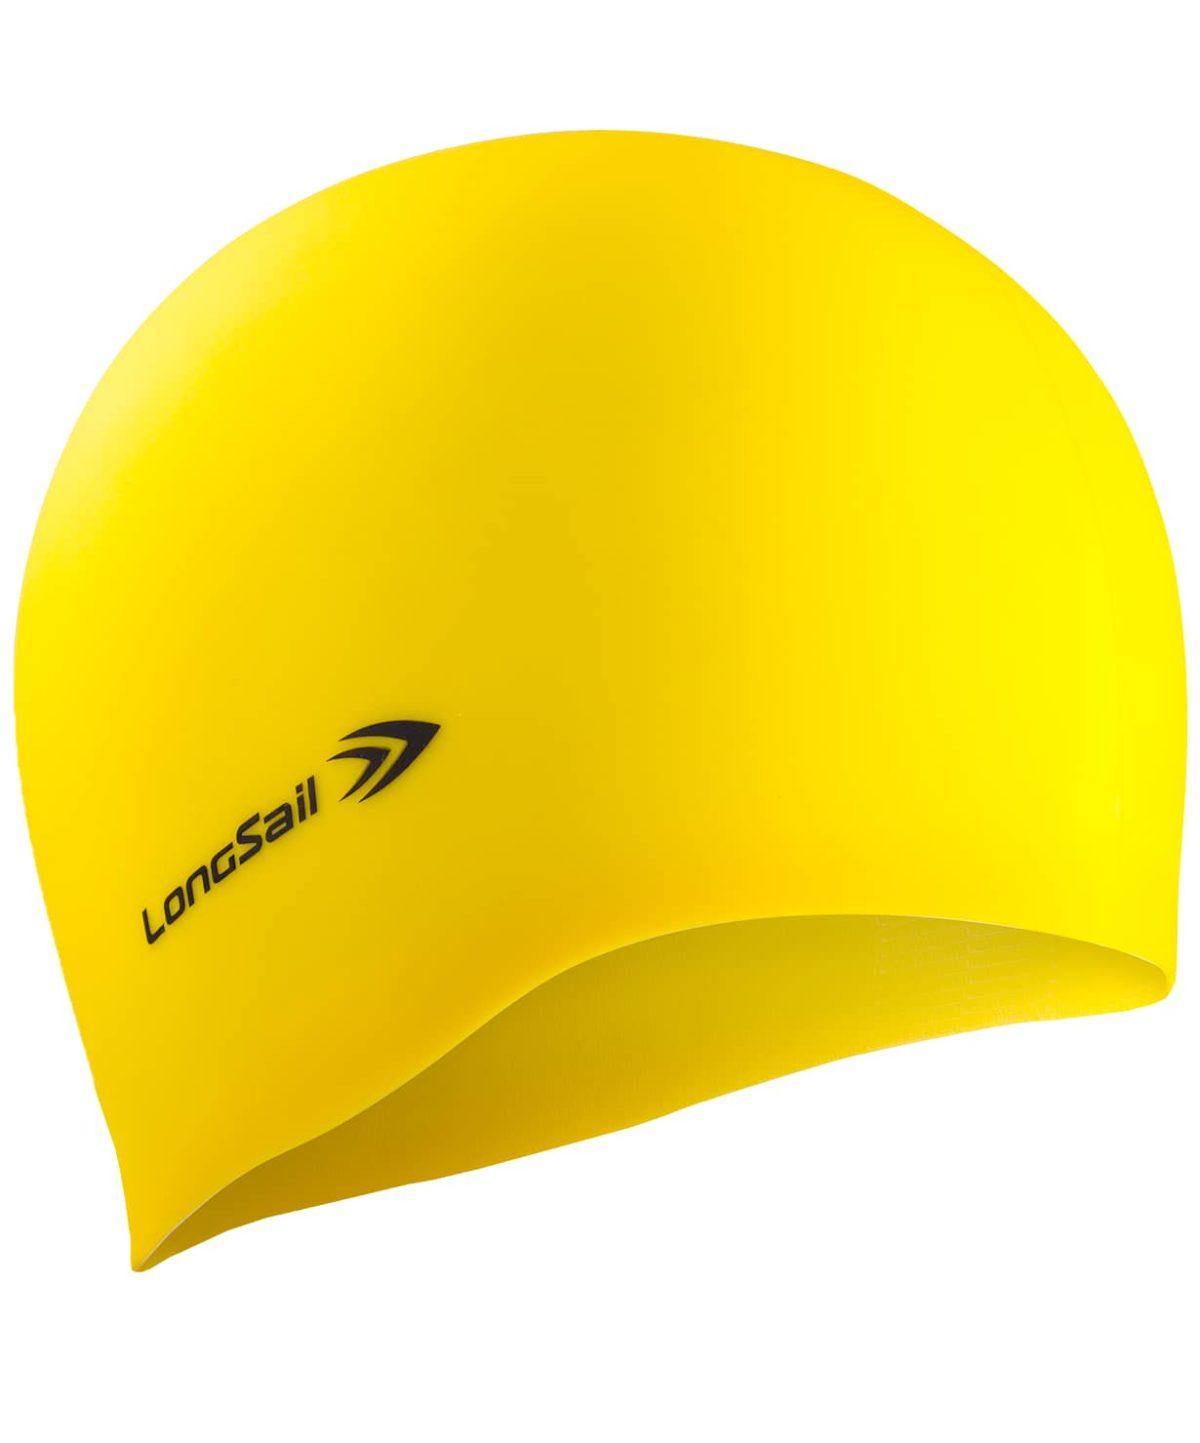 LONGSAIL  Шапочка для плавания силикон: жёлтый - 1